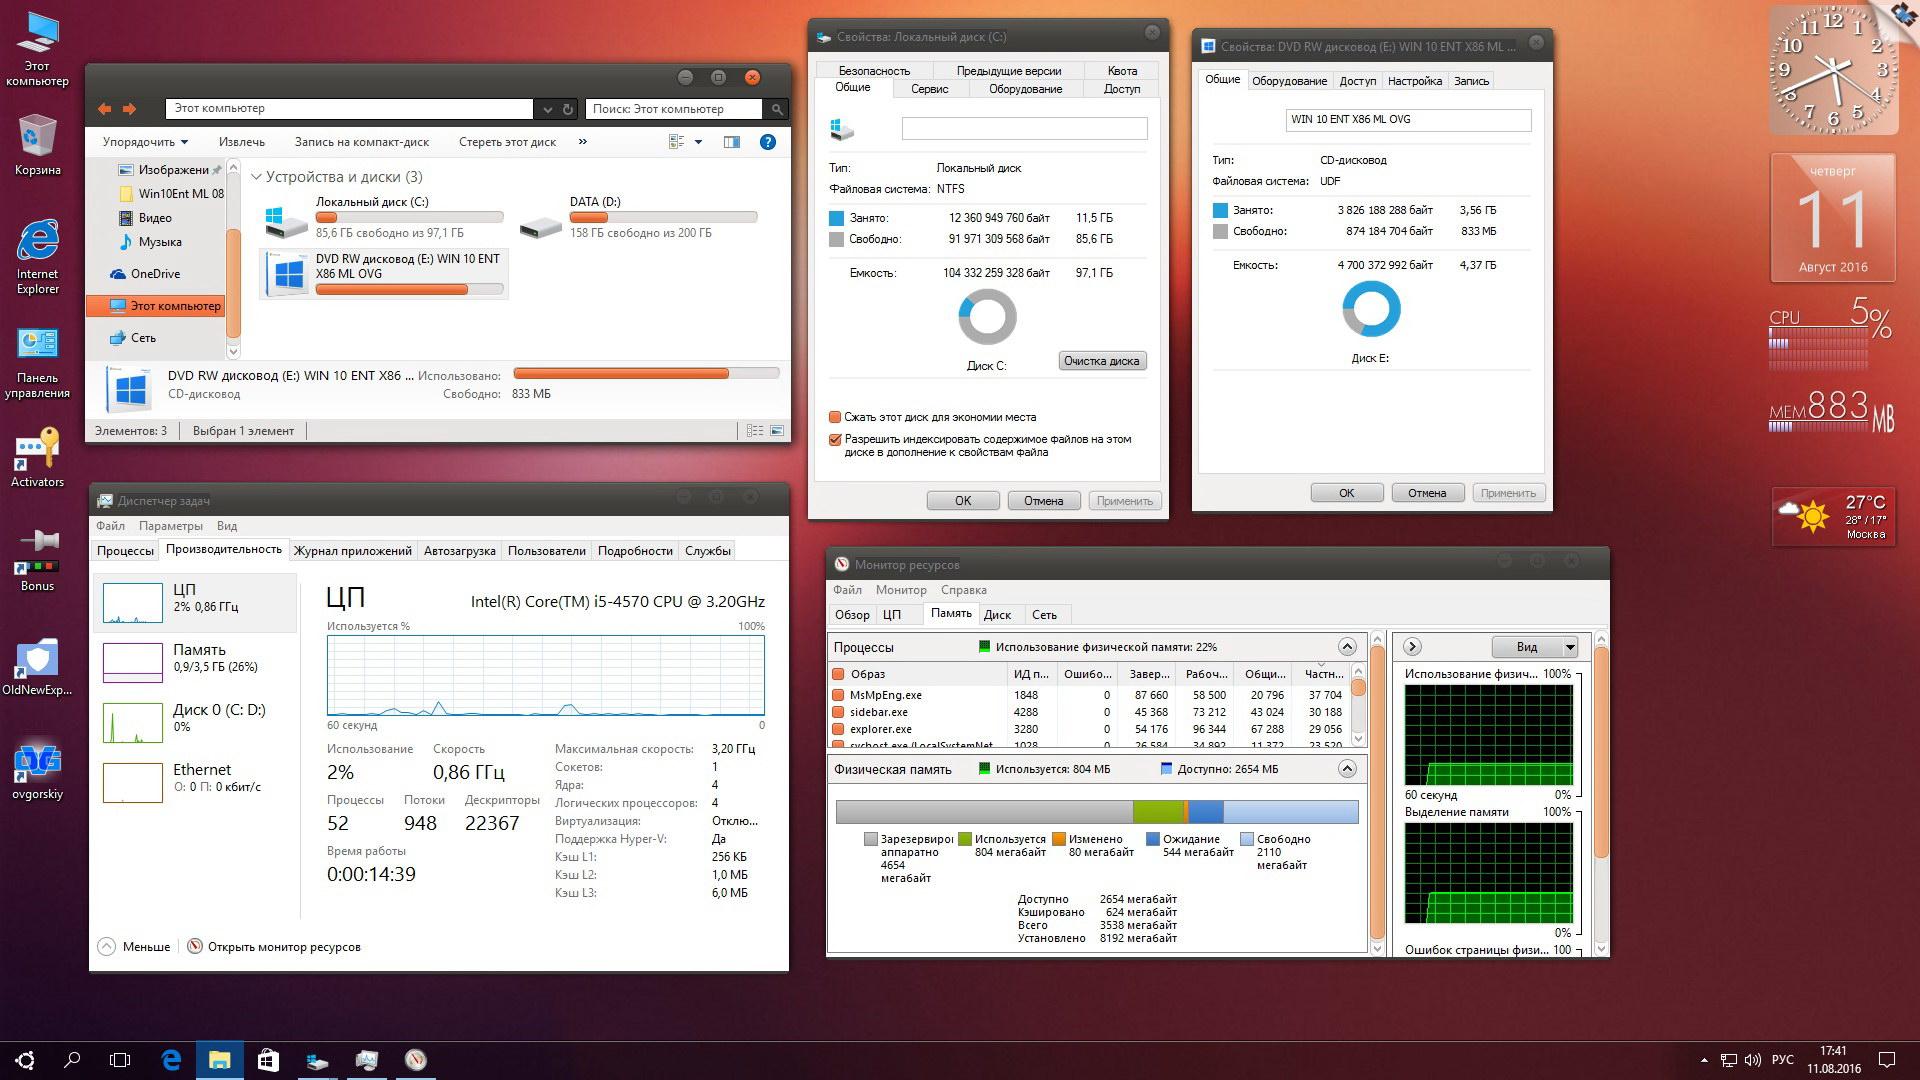 Microsoft Windows 10 Ent 1607 x86-x64 RU-en-de-uk by OVGorskiy 08.2016 2DVD